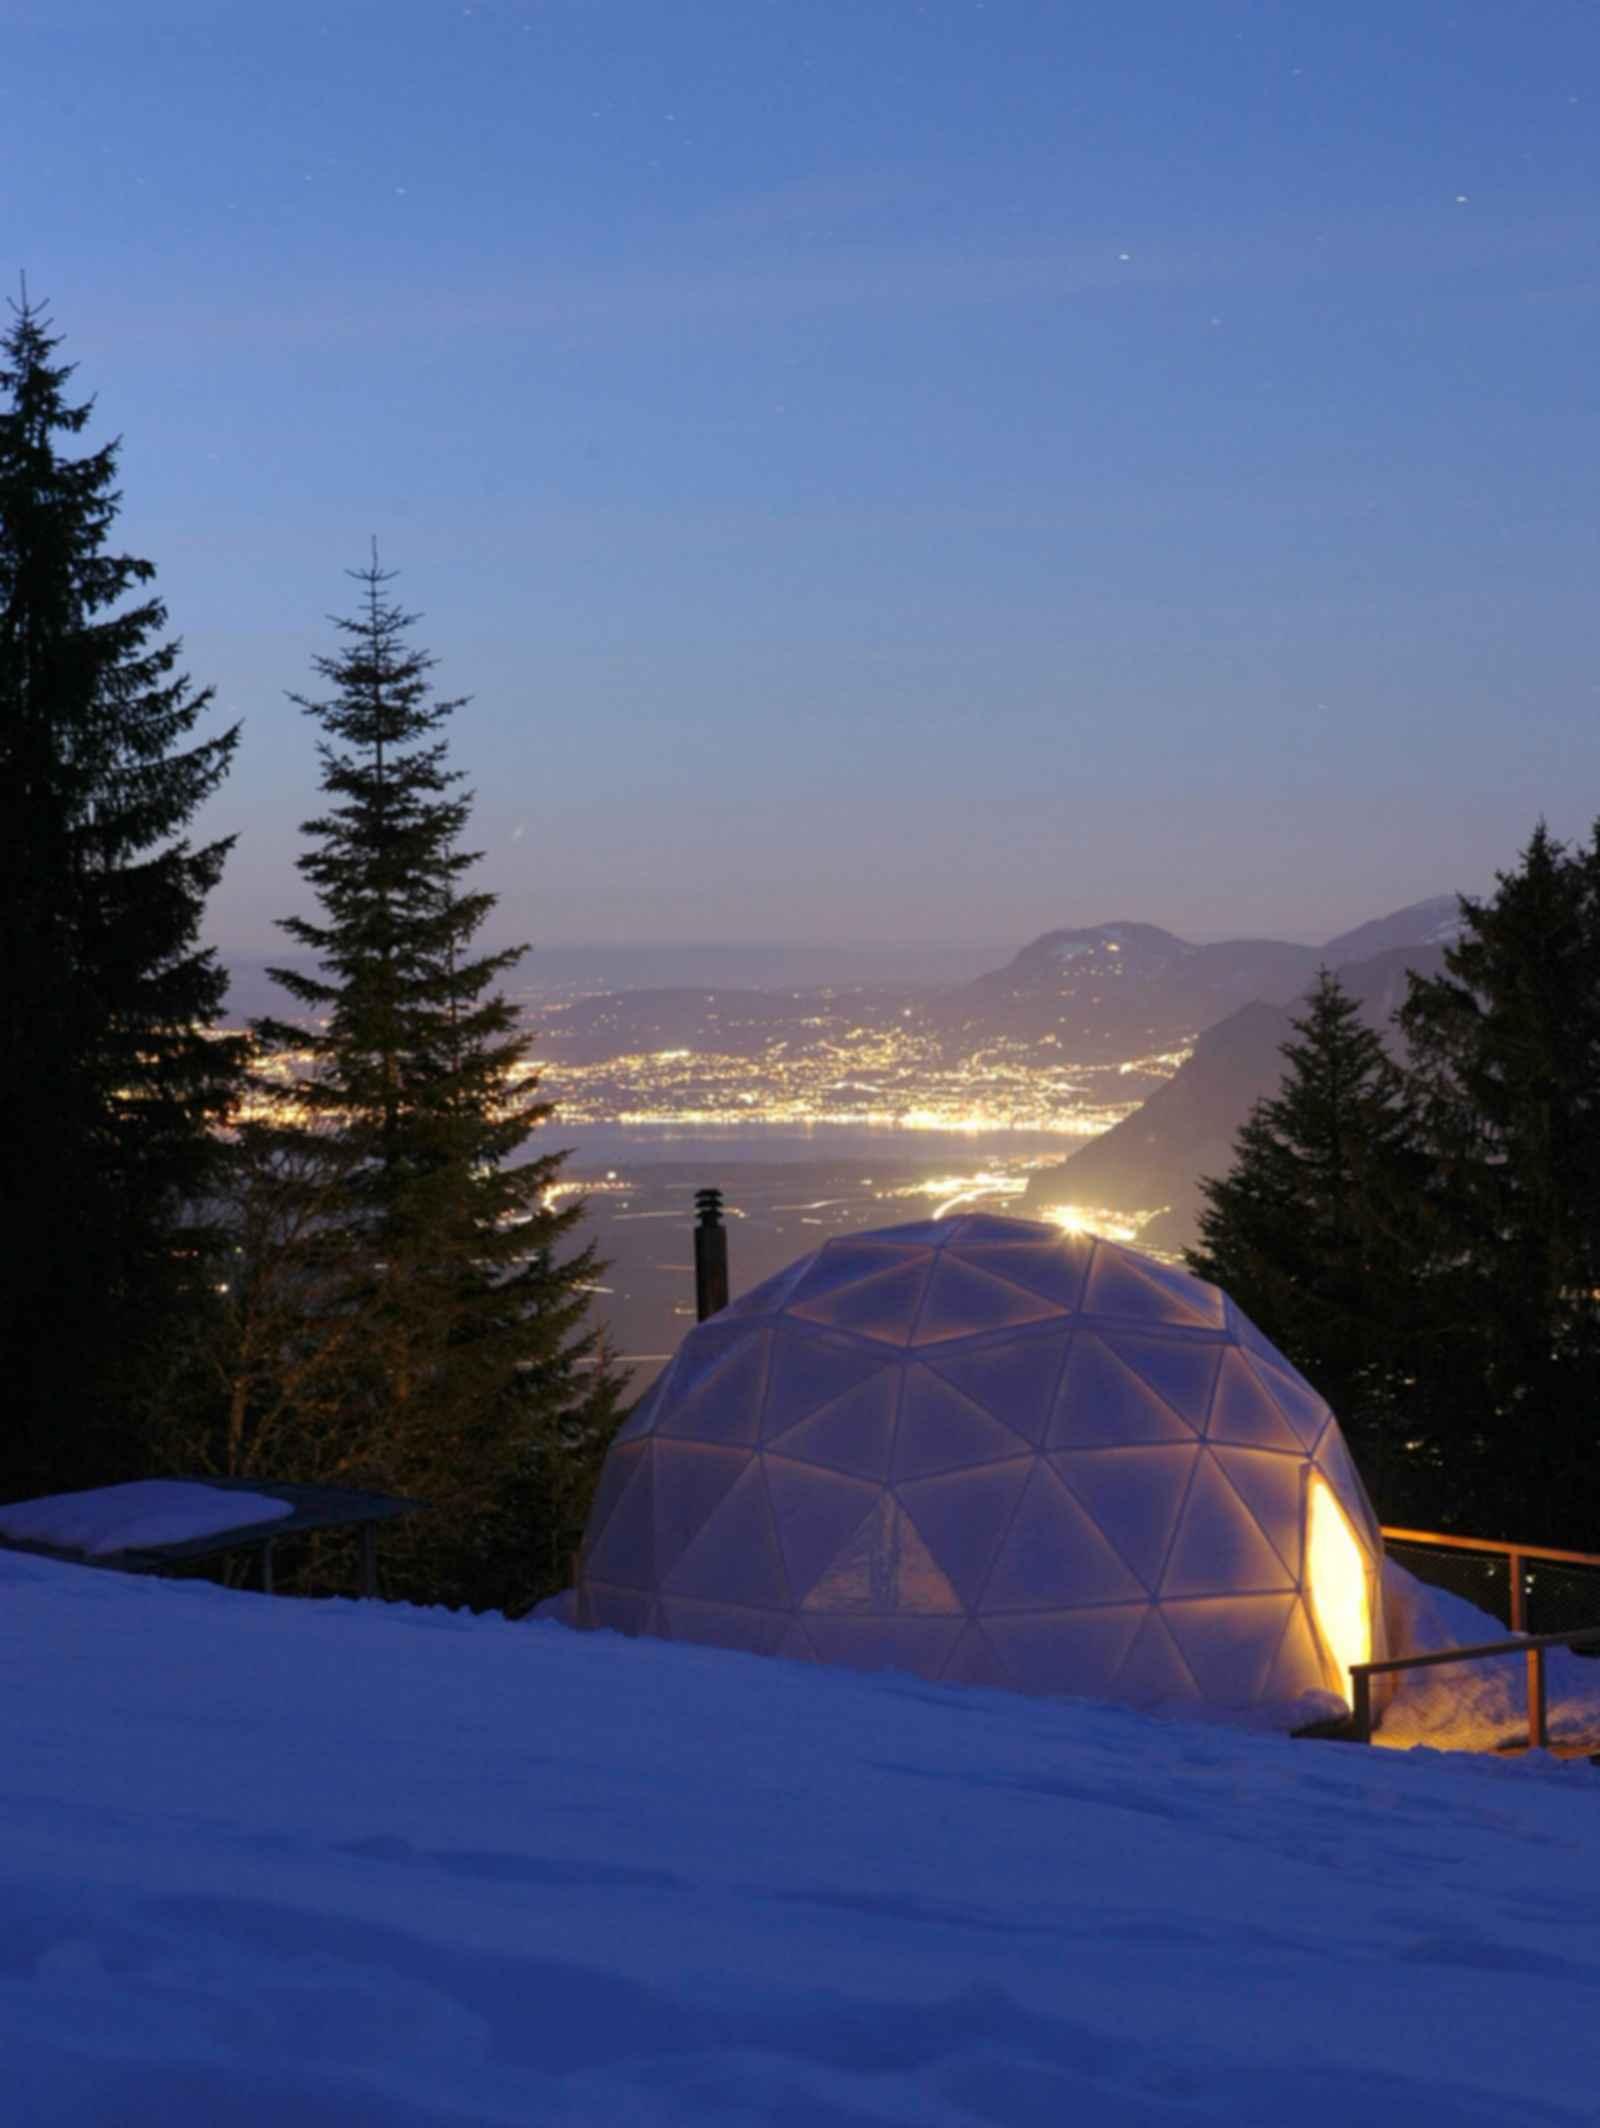 Hotel Whitepod - Exterior at Night/Landscape